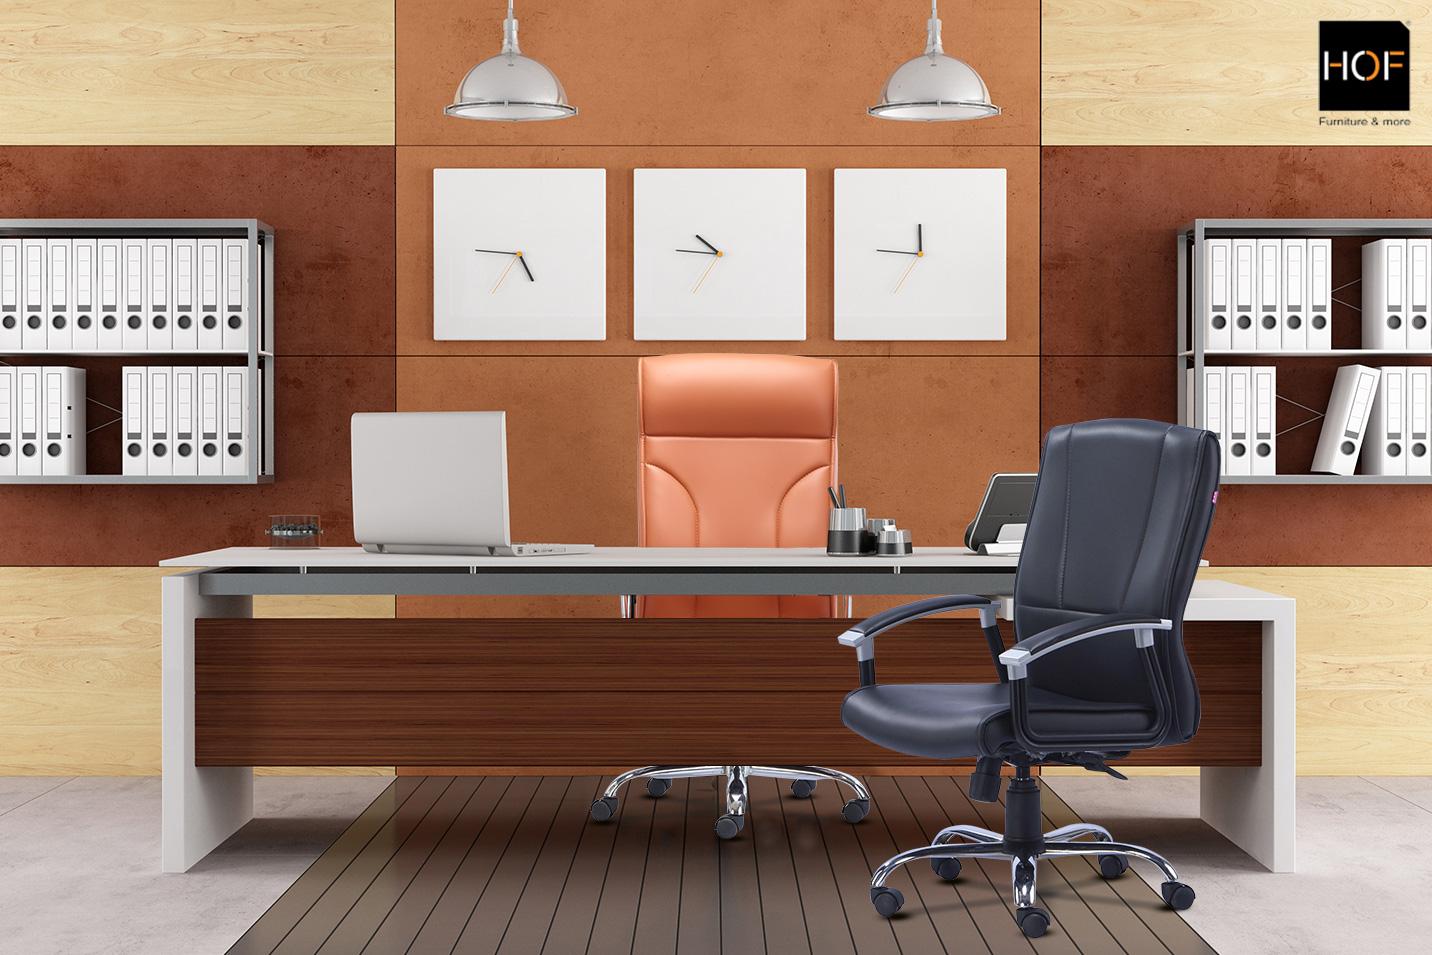 What to Consider Before Buying Ergonomic Chairs